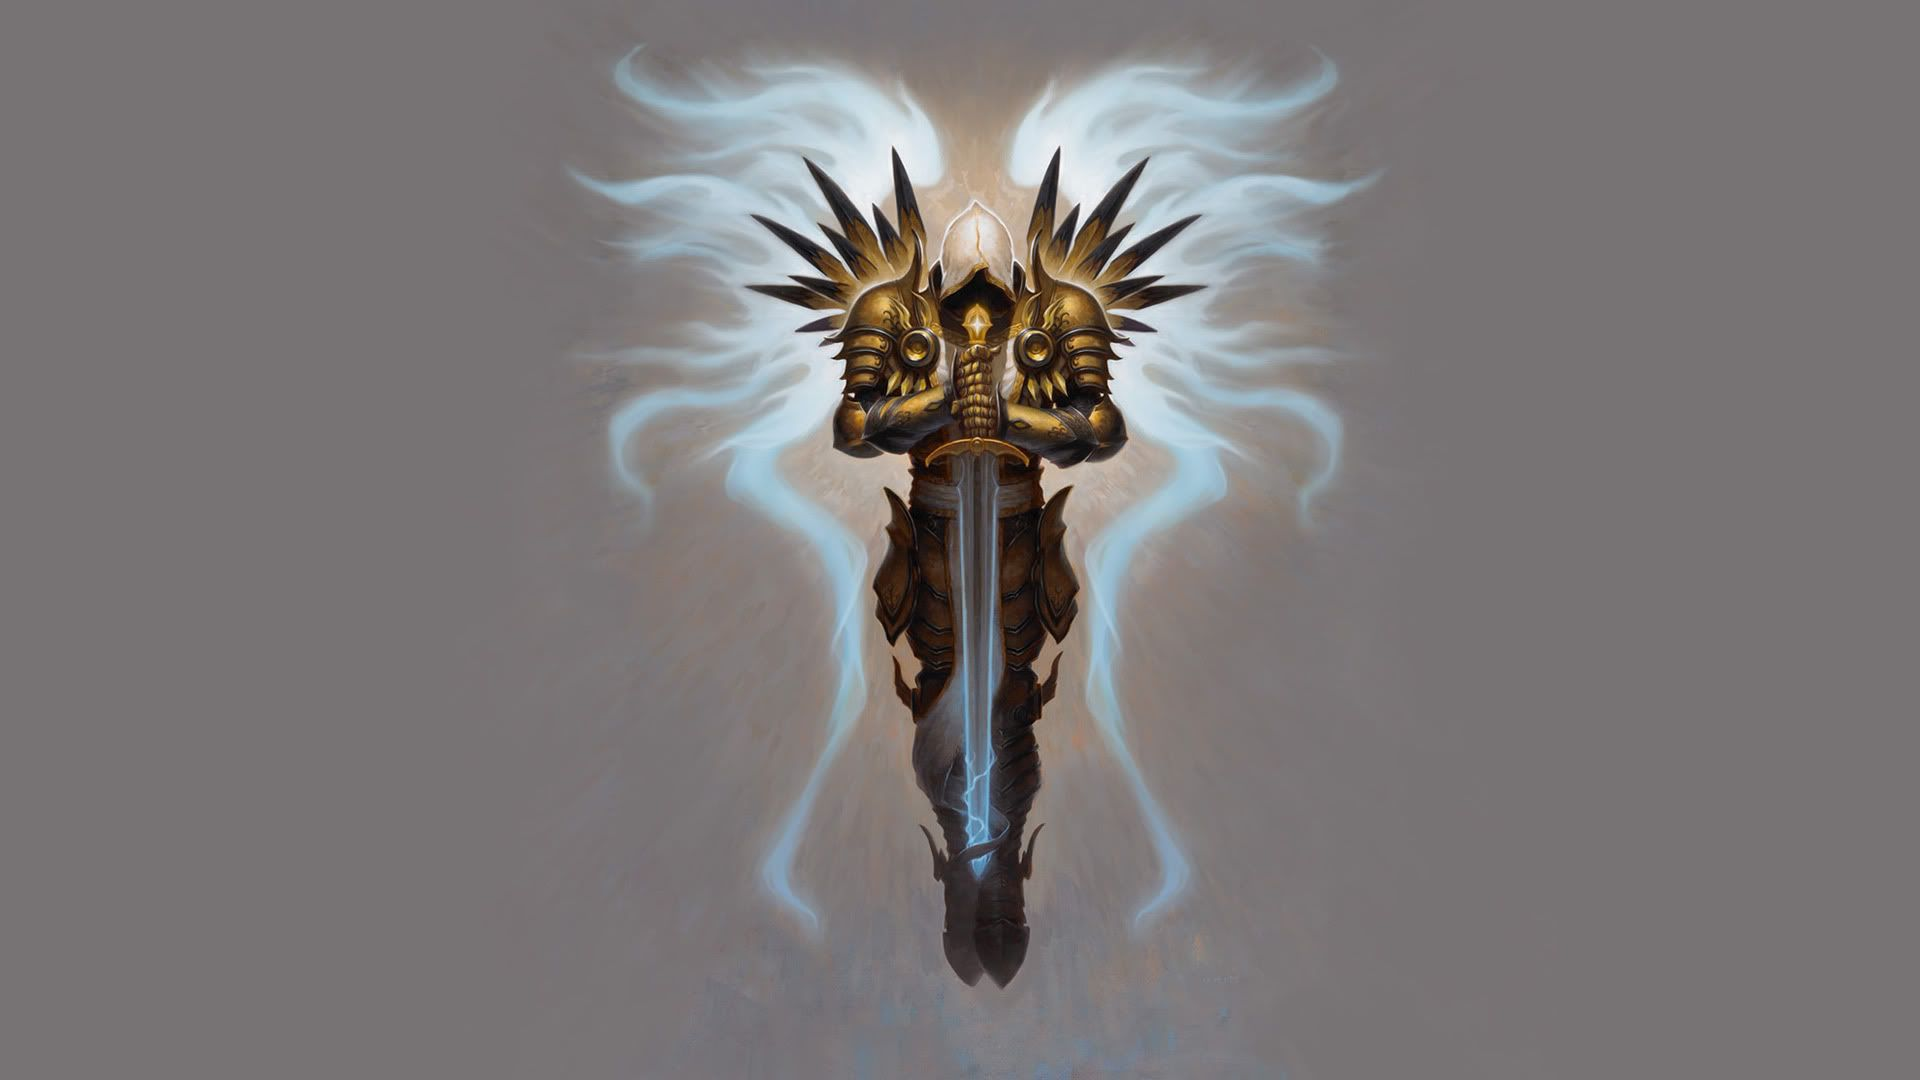 IPhone Video Game Diablo III Wallpaper ID 1024x768 3 Tyrael Wallpapers 33